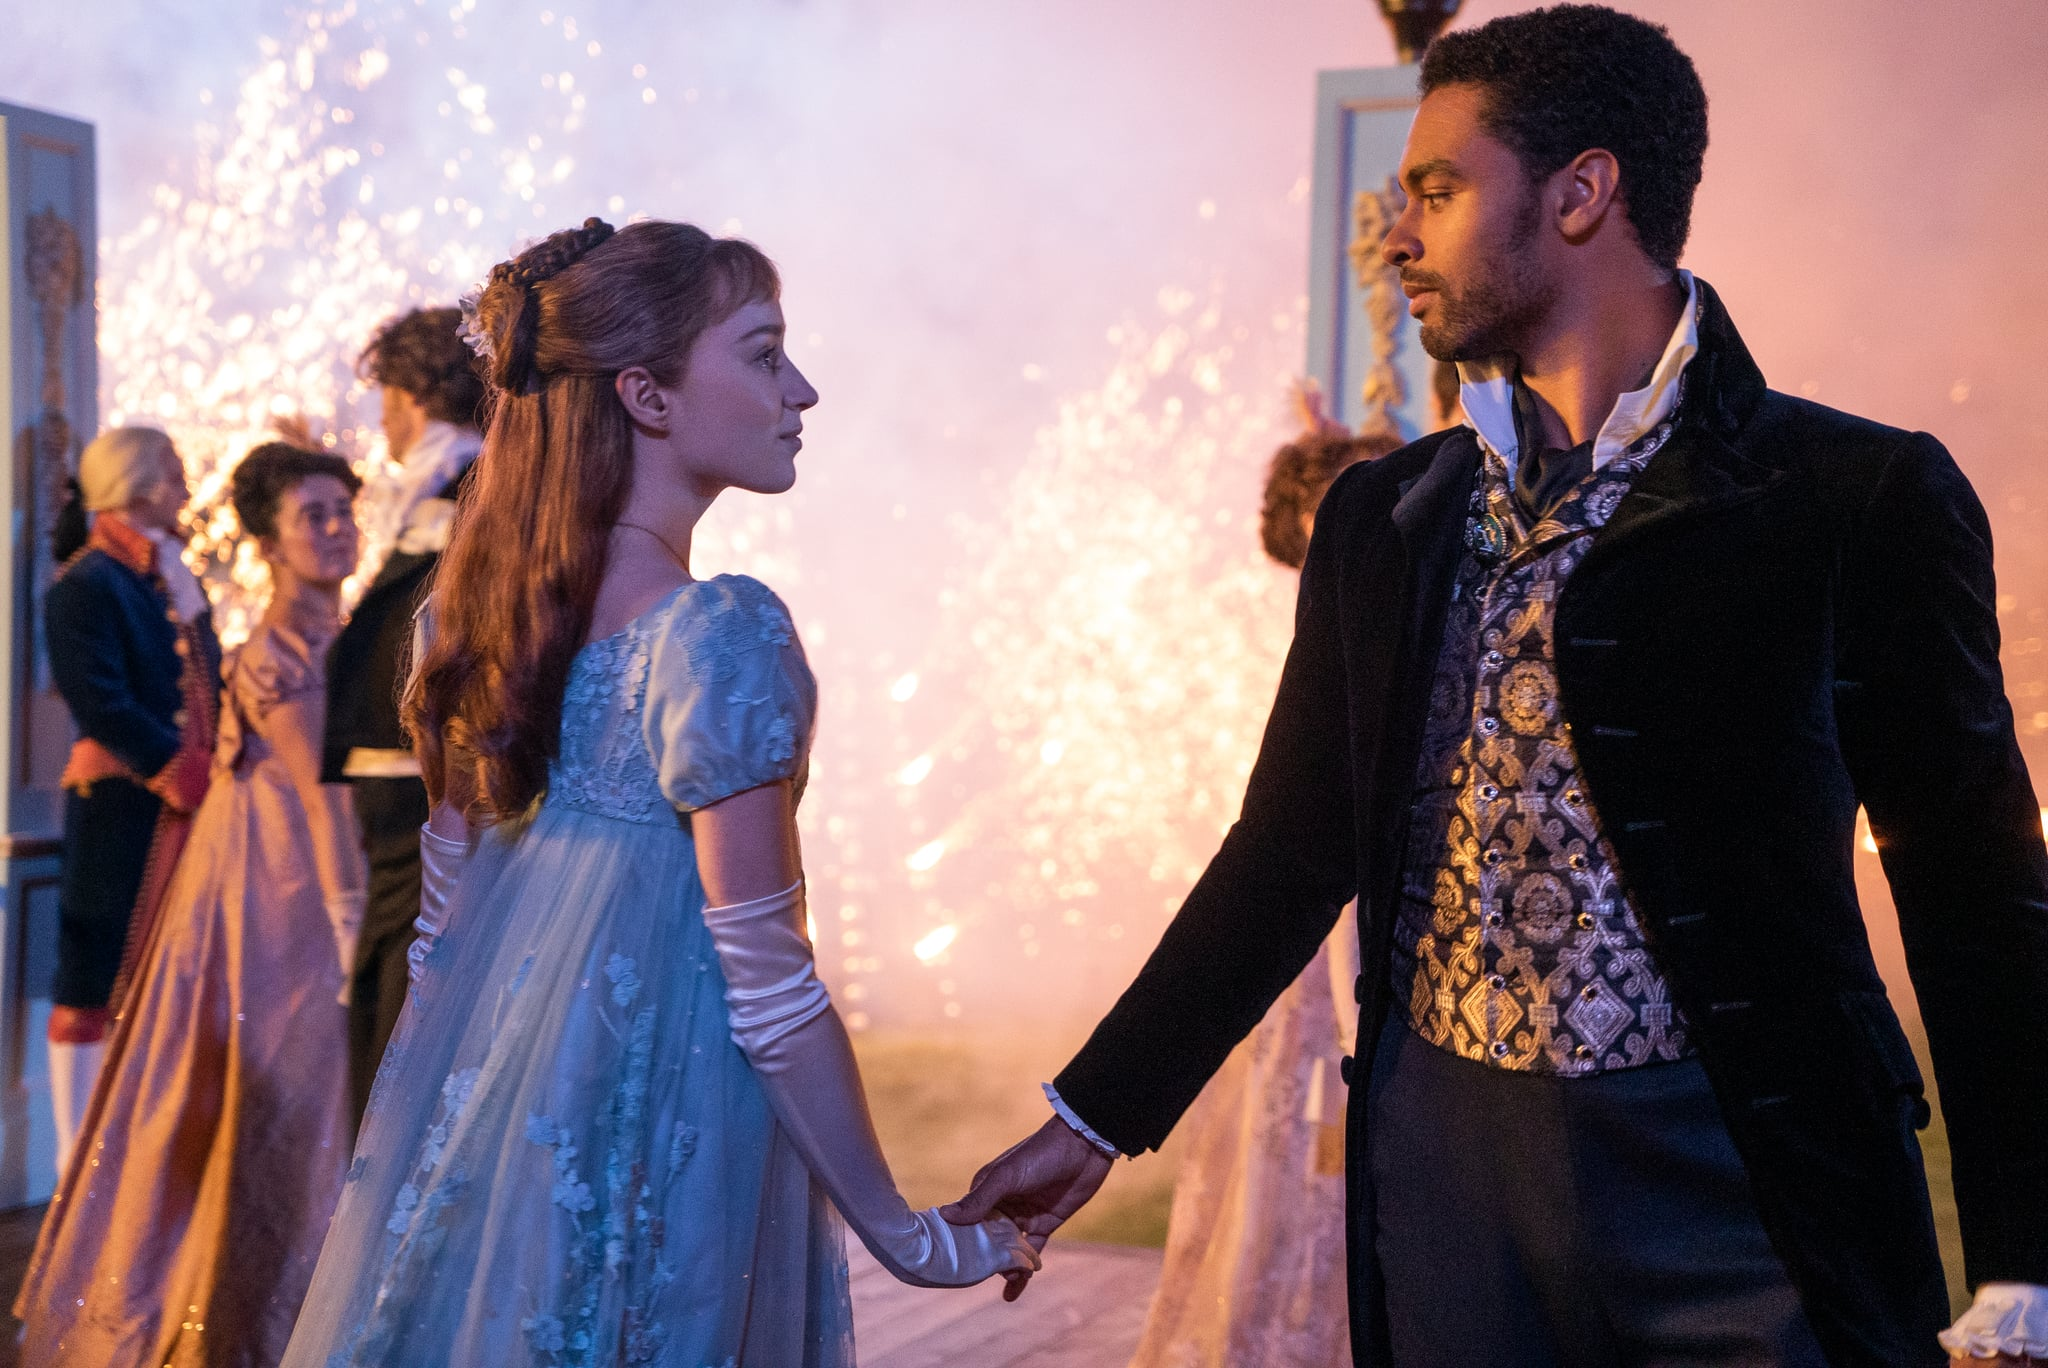 A scene from Bridgerton where Daphne dances with Simon